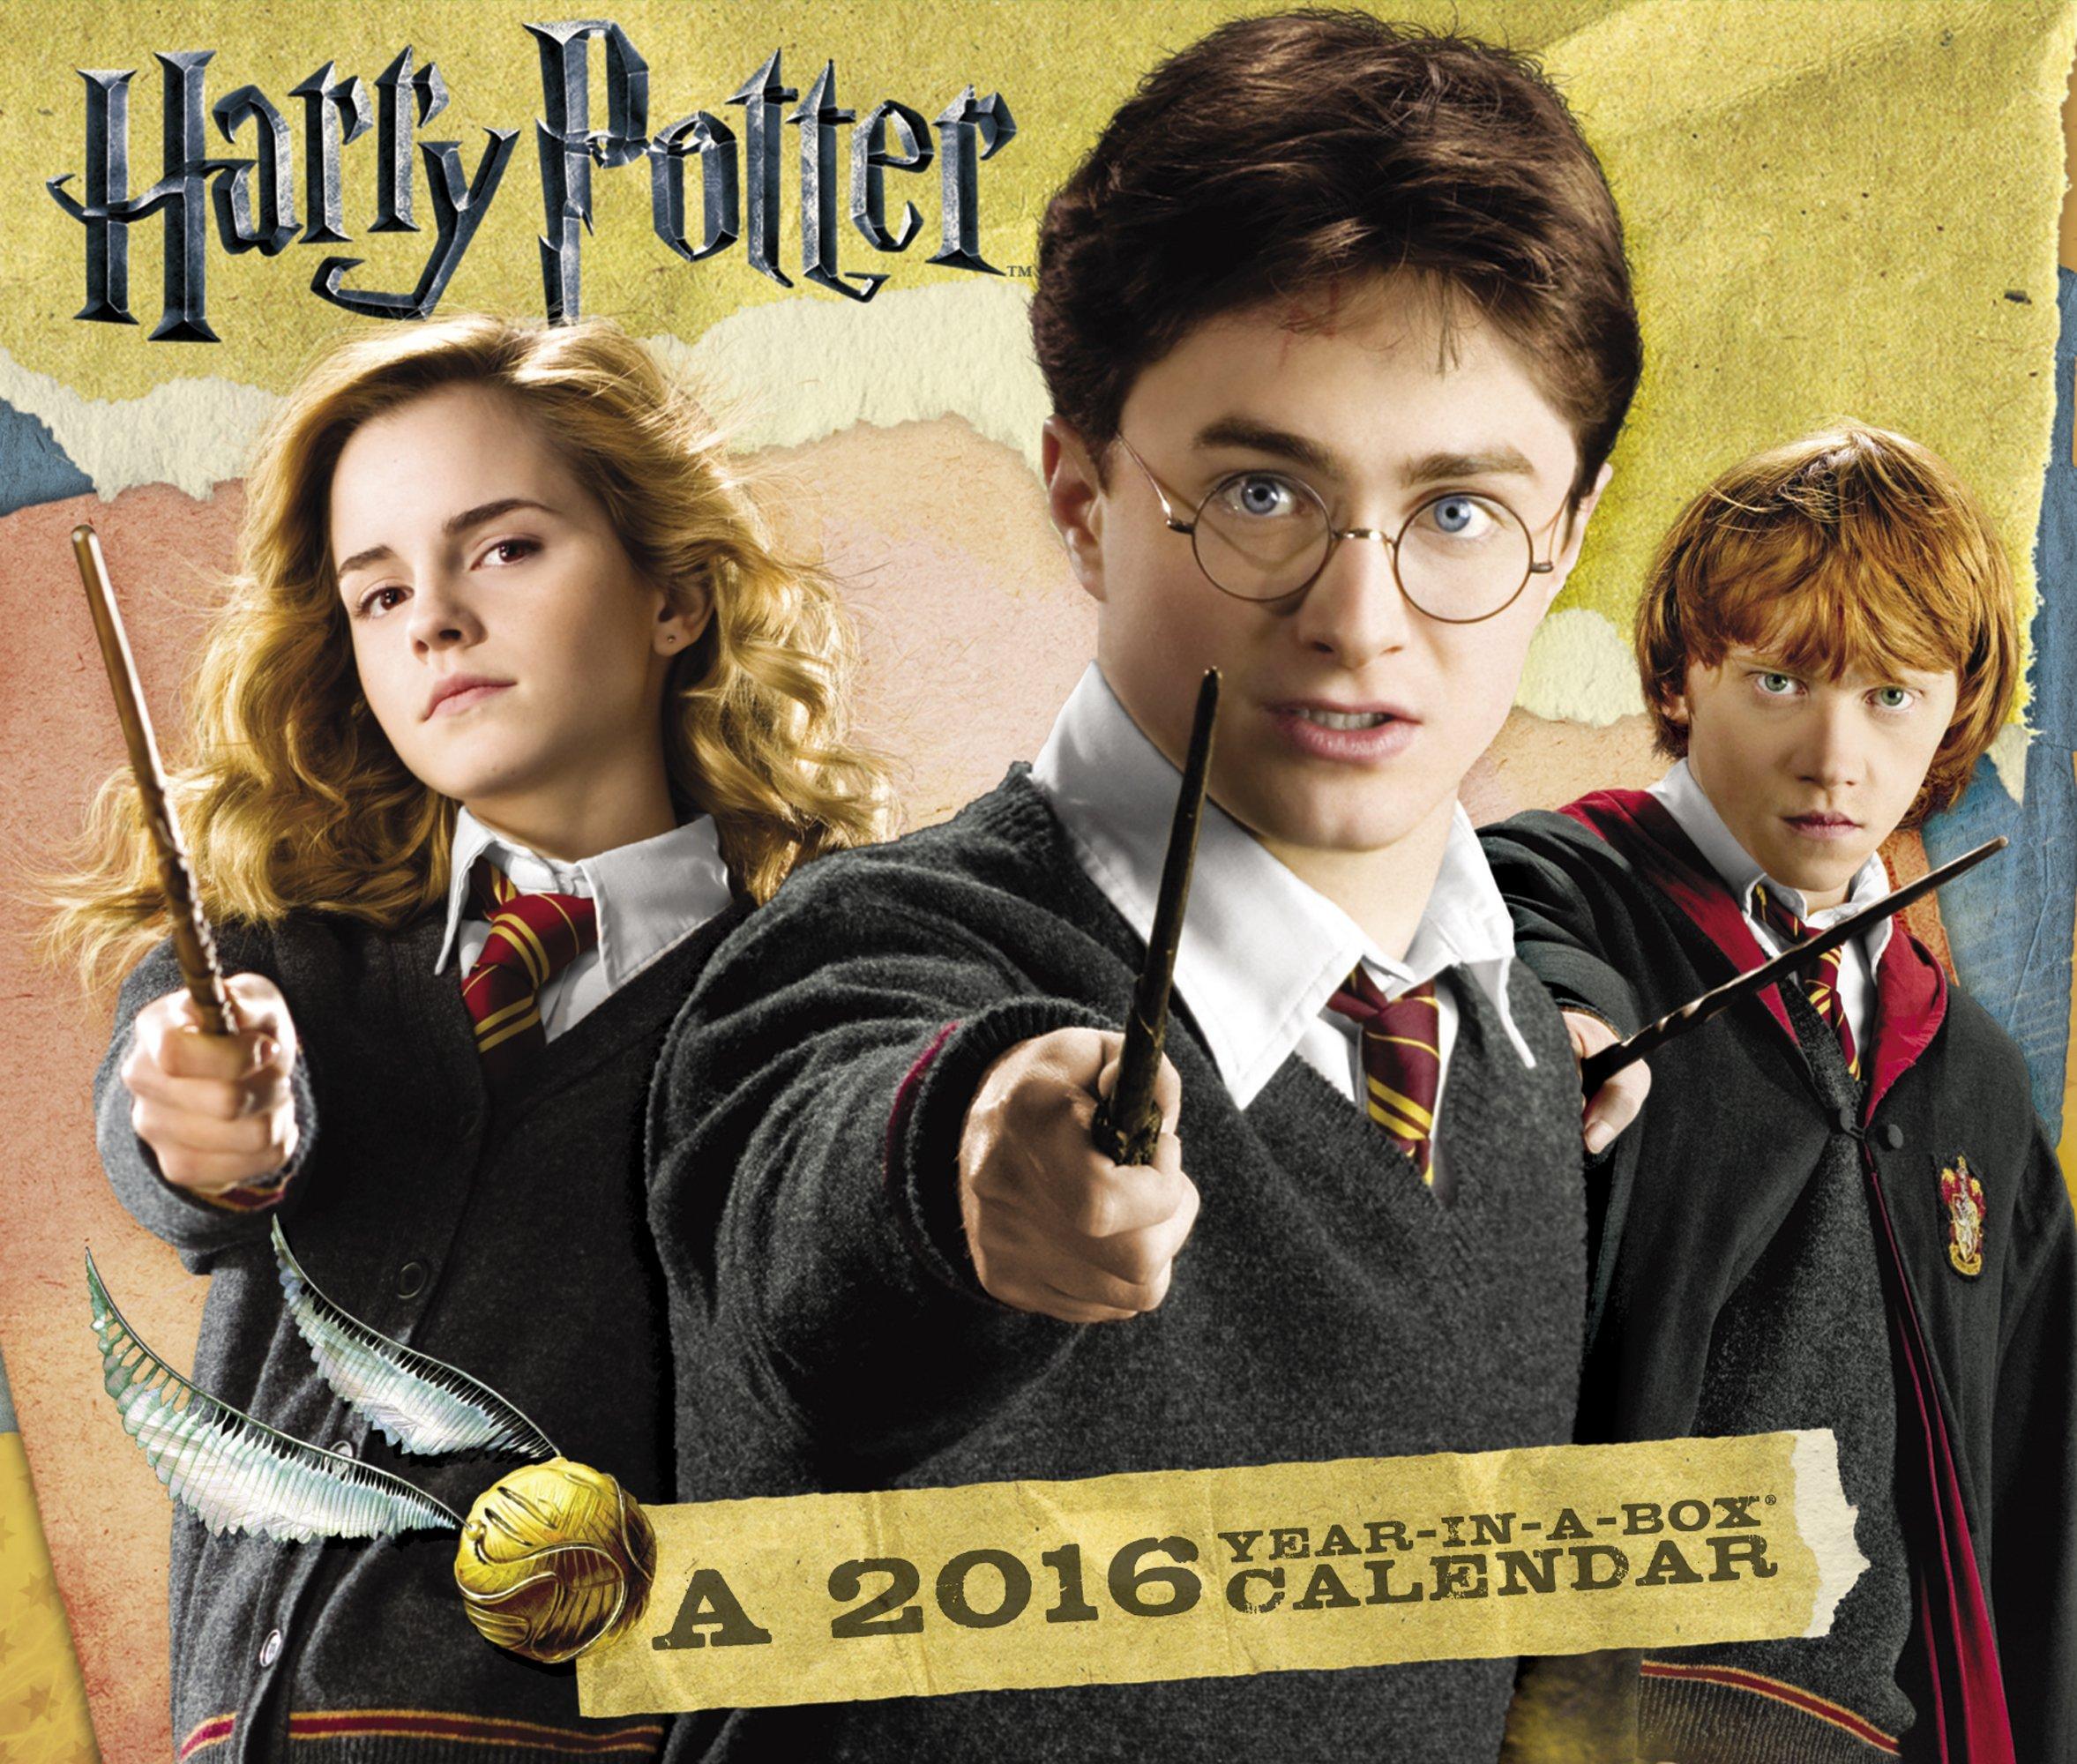 Weihnachtskalender Harry Potter.Harry Potter 2016 Calendar Acco Brands 0038576390669 Books